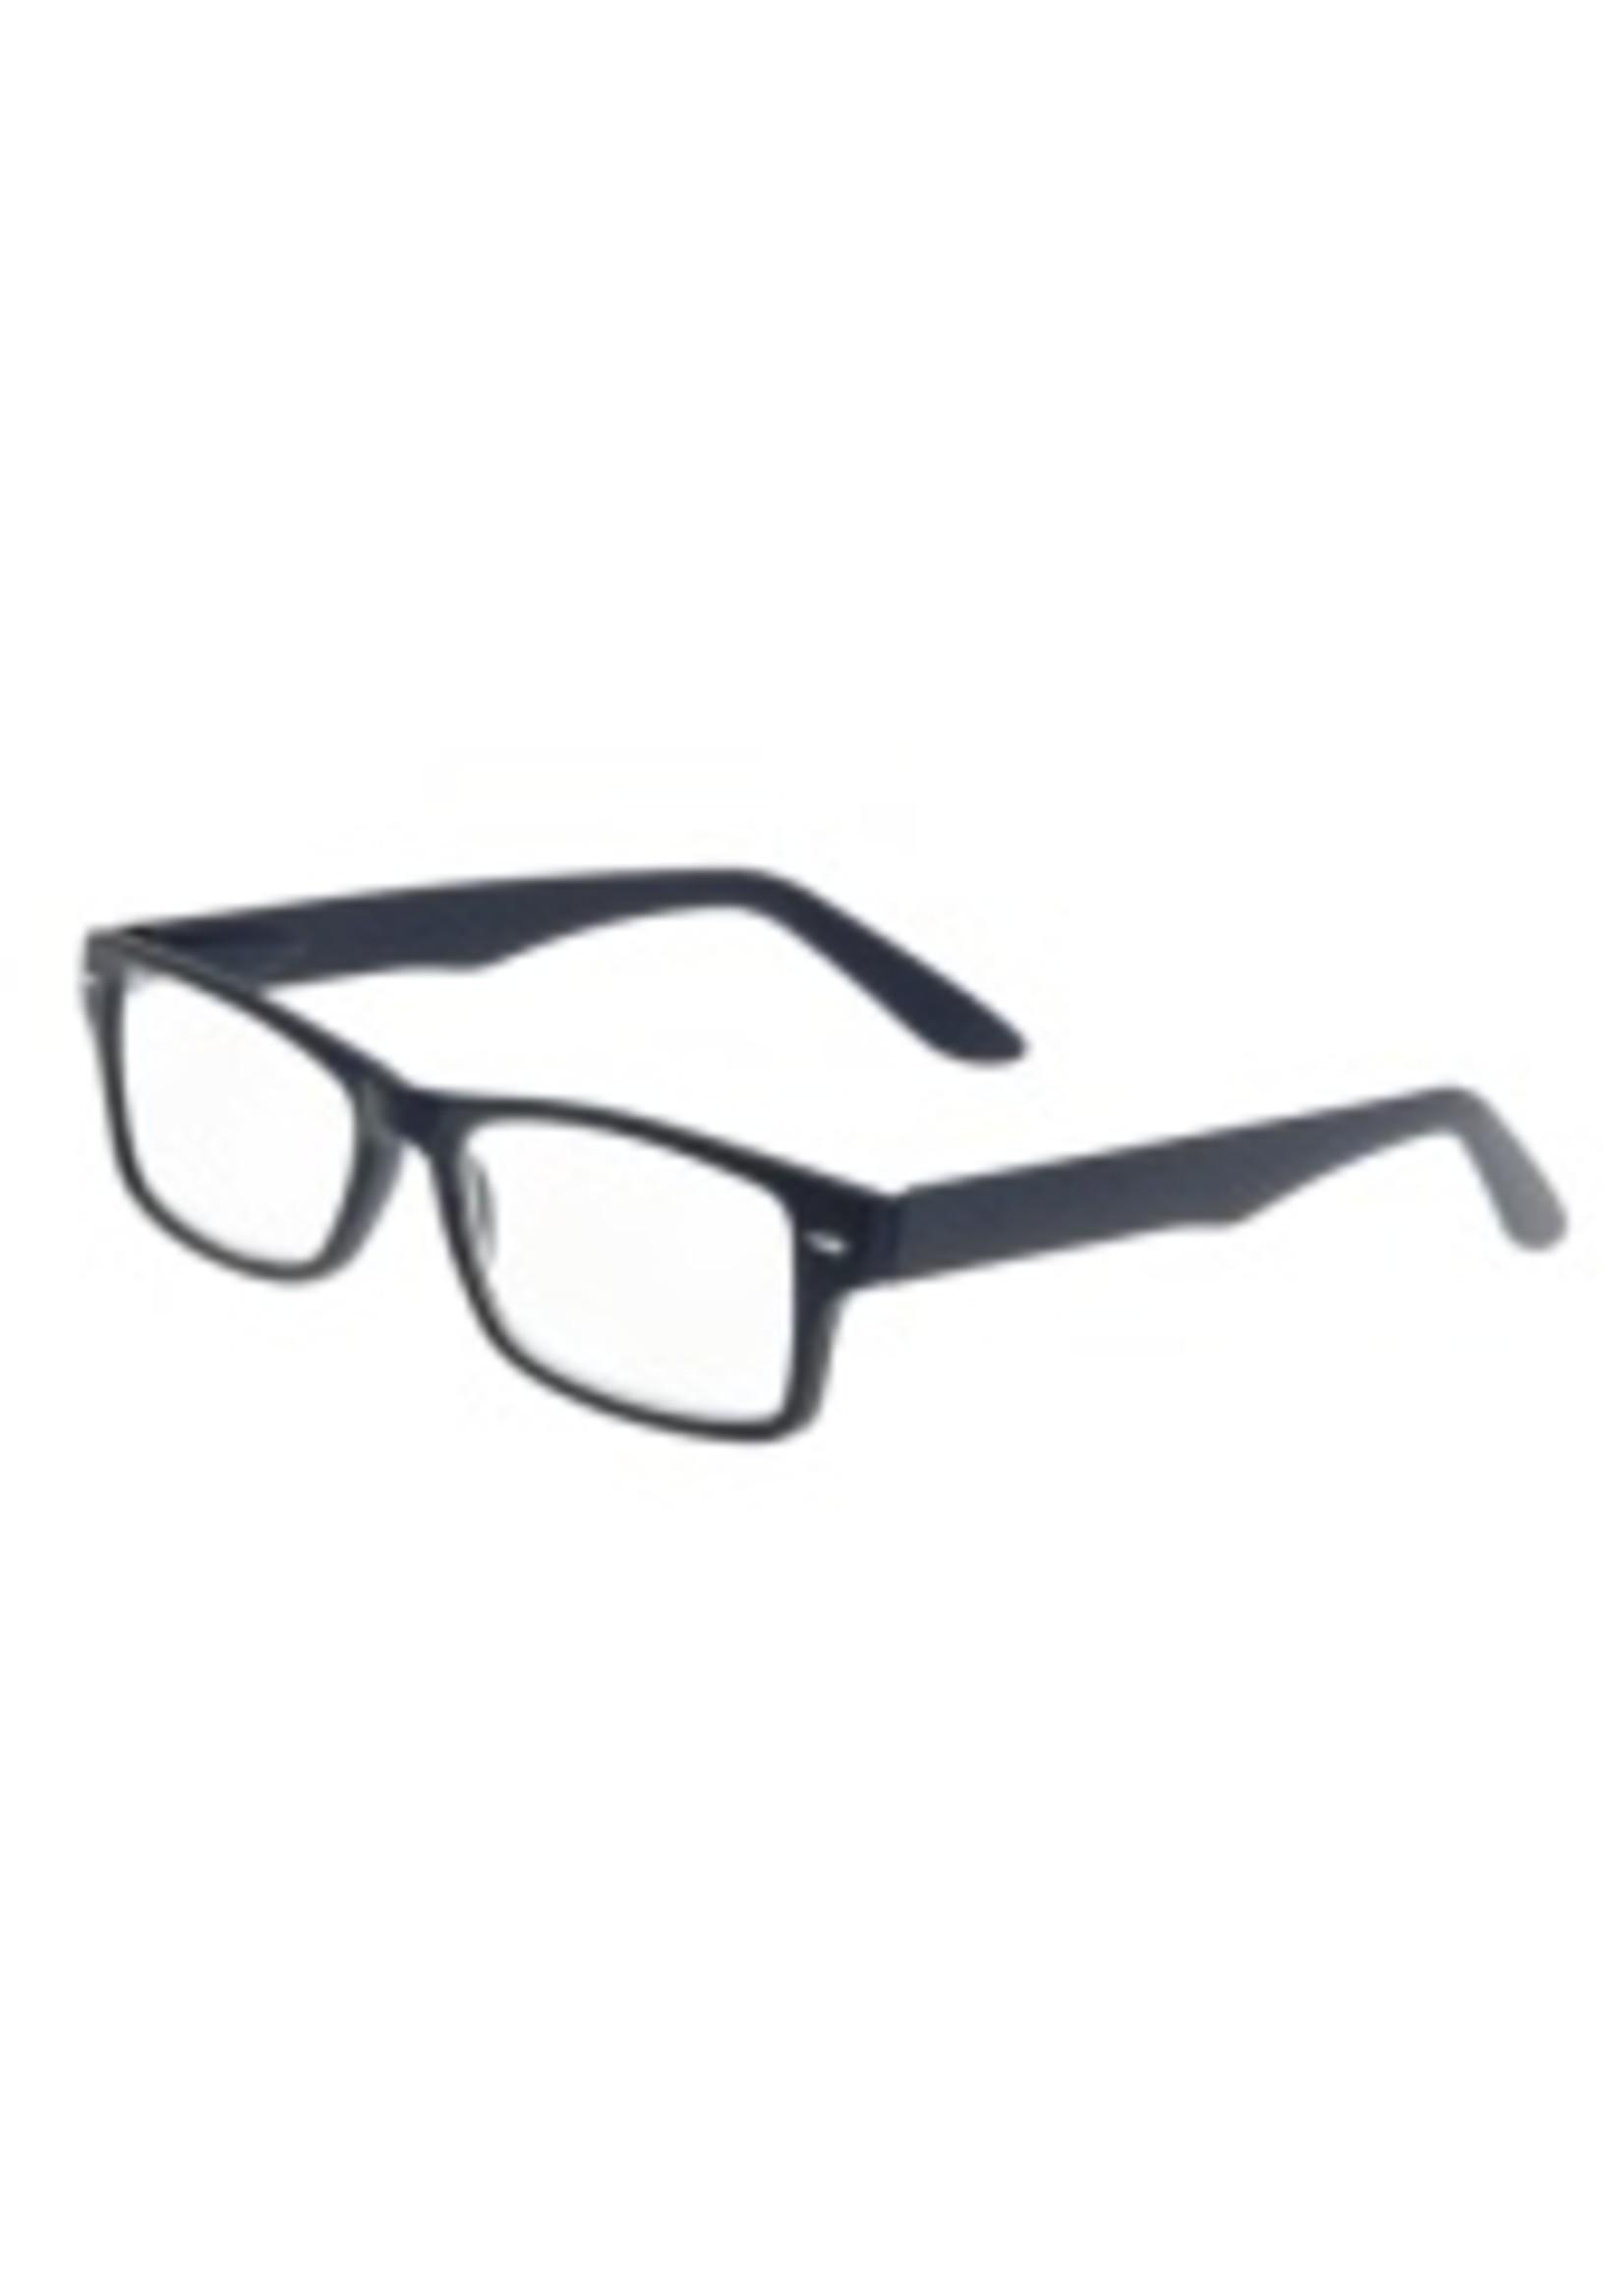 Leesbril model Jesse Mat Zwart